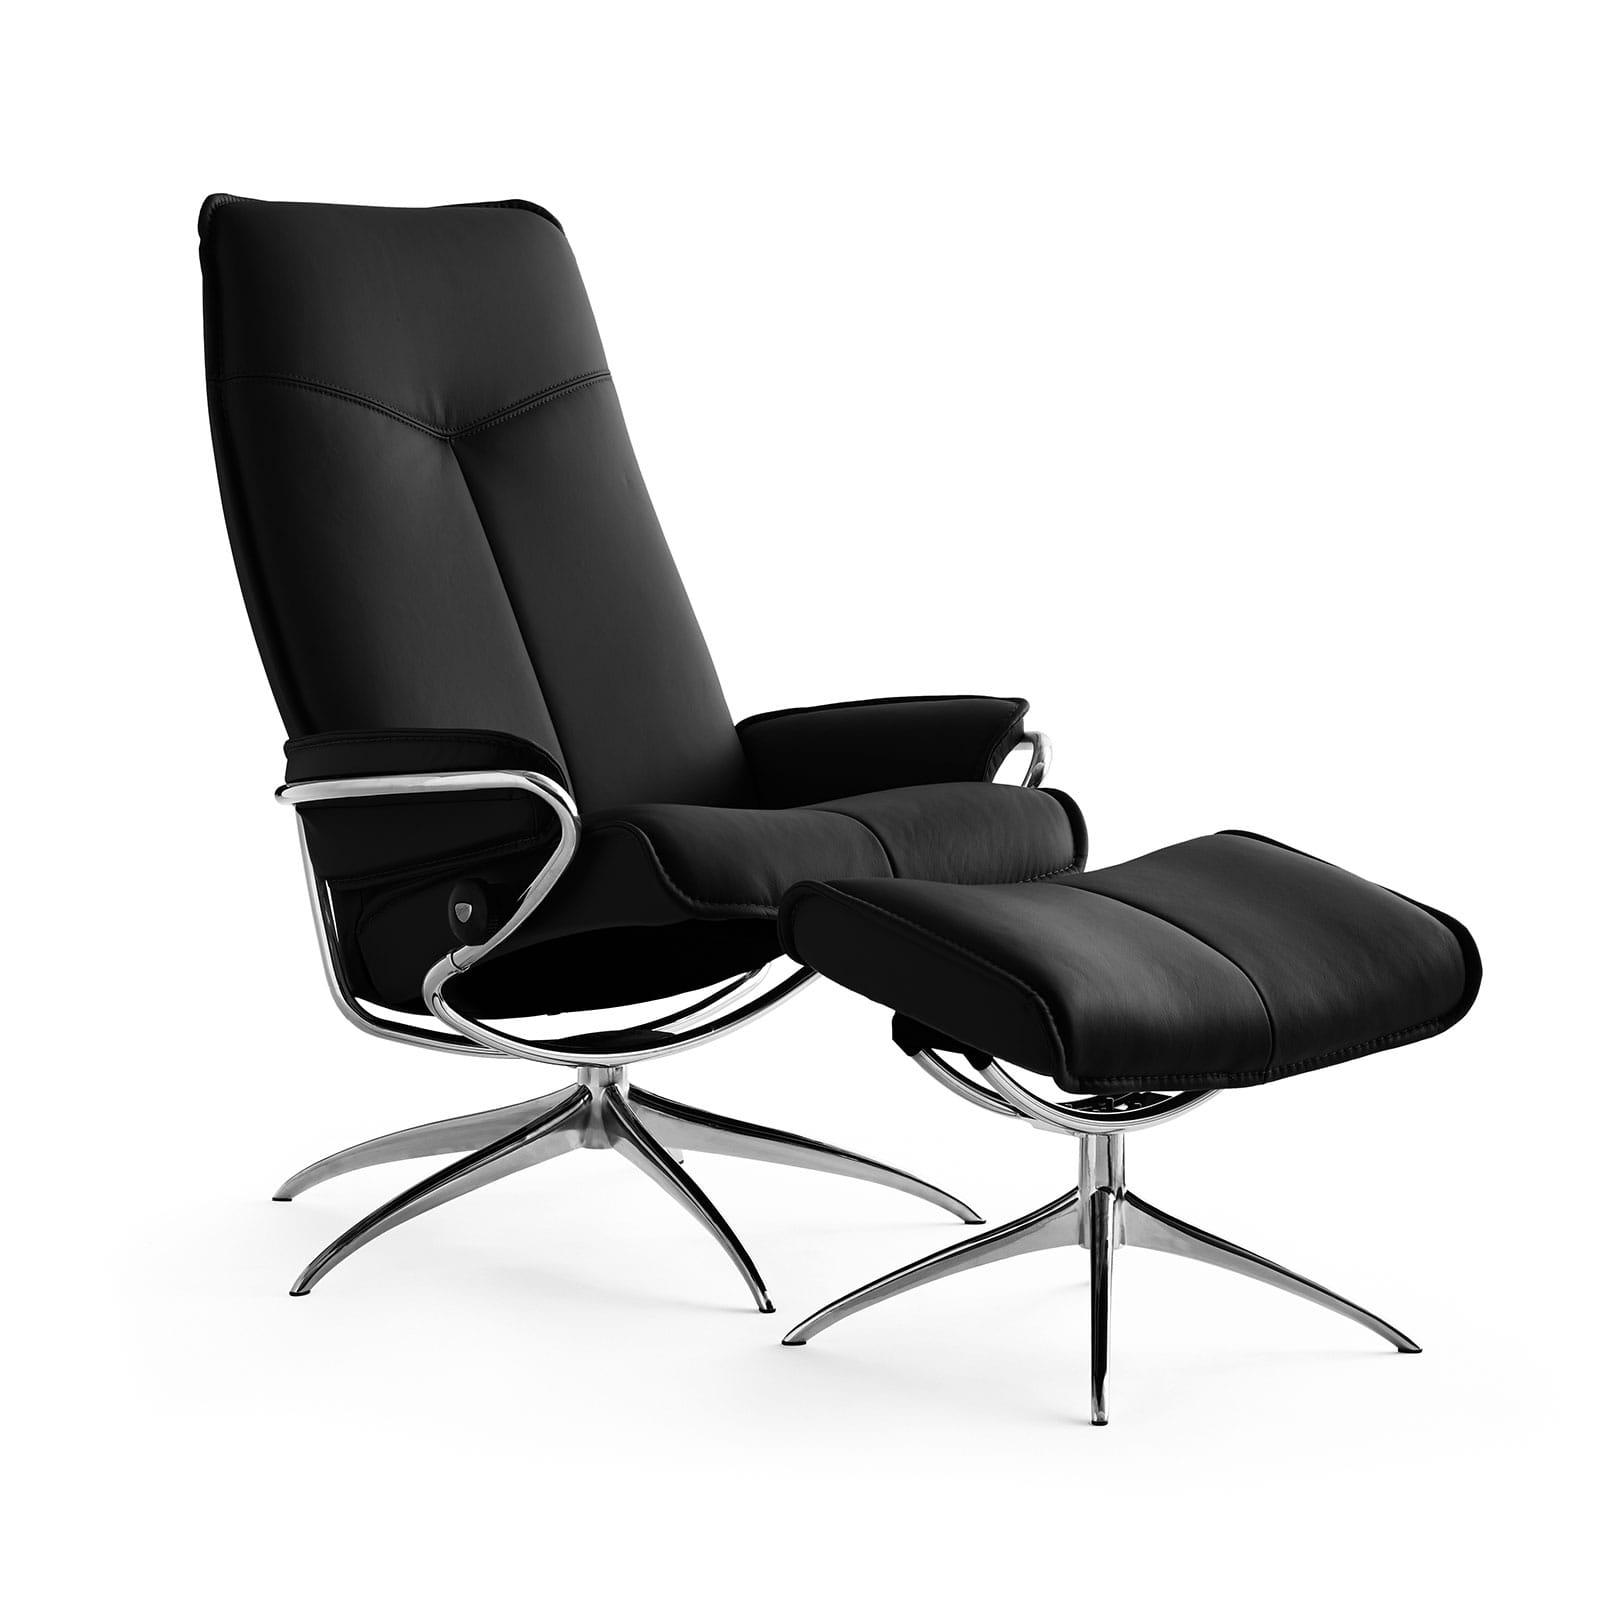 Stressless Sofa Kika Stressless Sessel Bezug Wechseln Sesselbezug